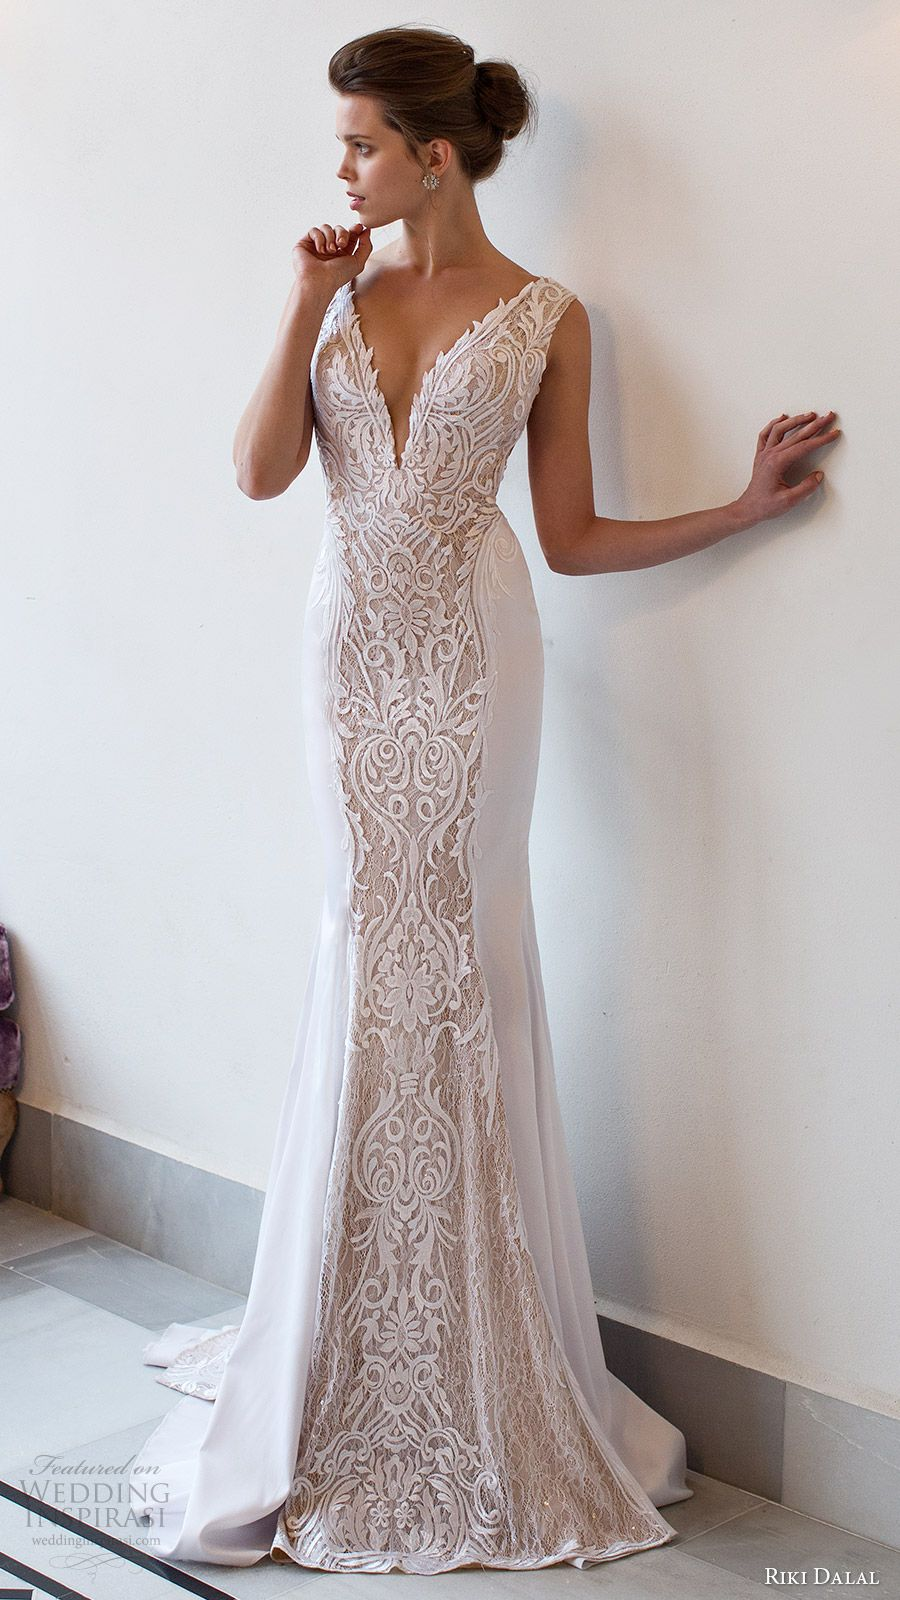 Riki Dalal 2016 Wedding Dresses Verona Bridal Collection Wedding Inspirasi Wedding Dresses V Neck Wedding Dress 2016 Wedding Dresses